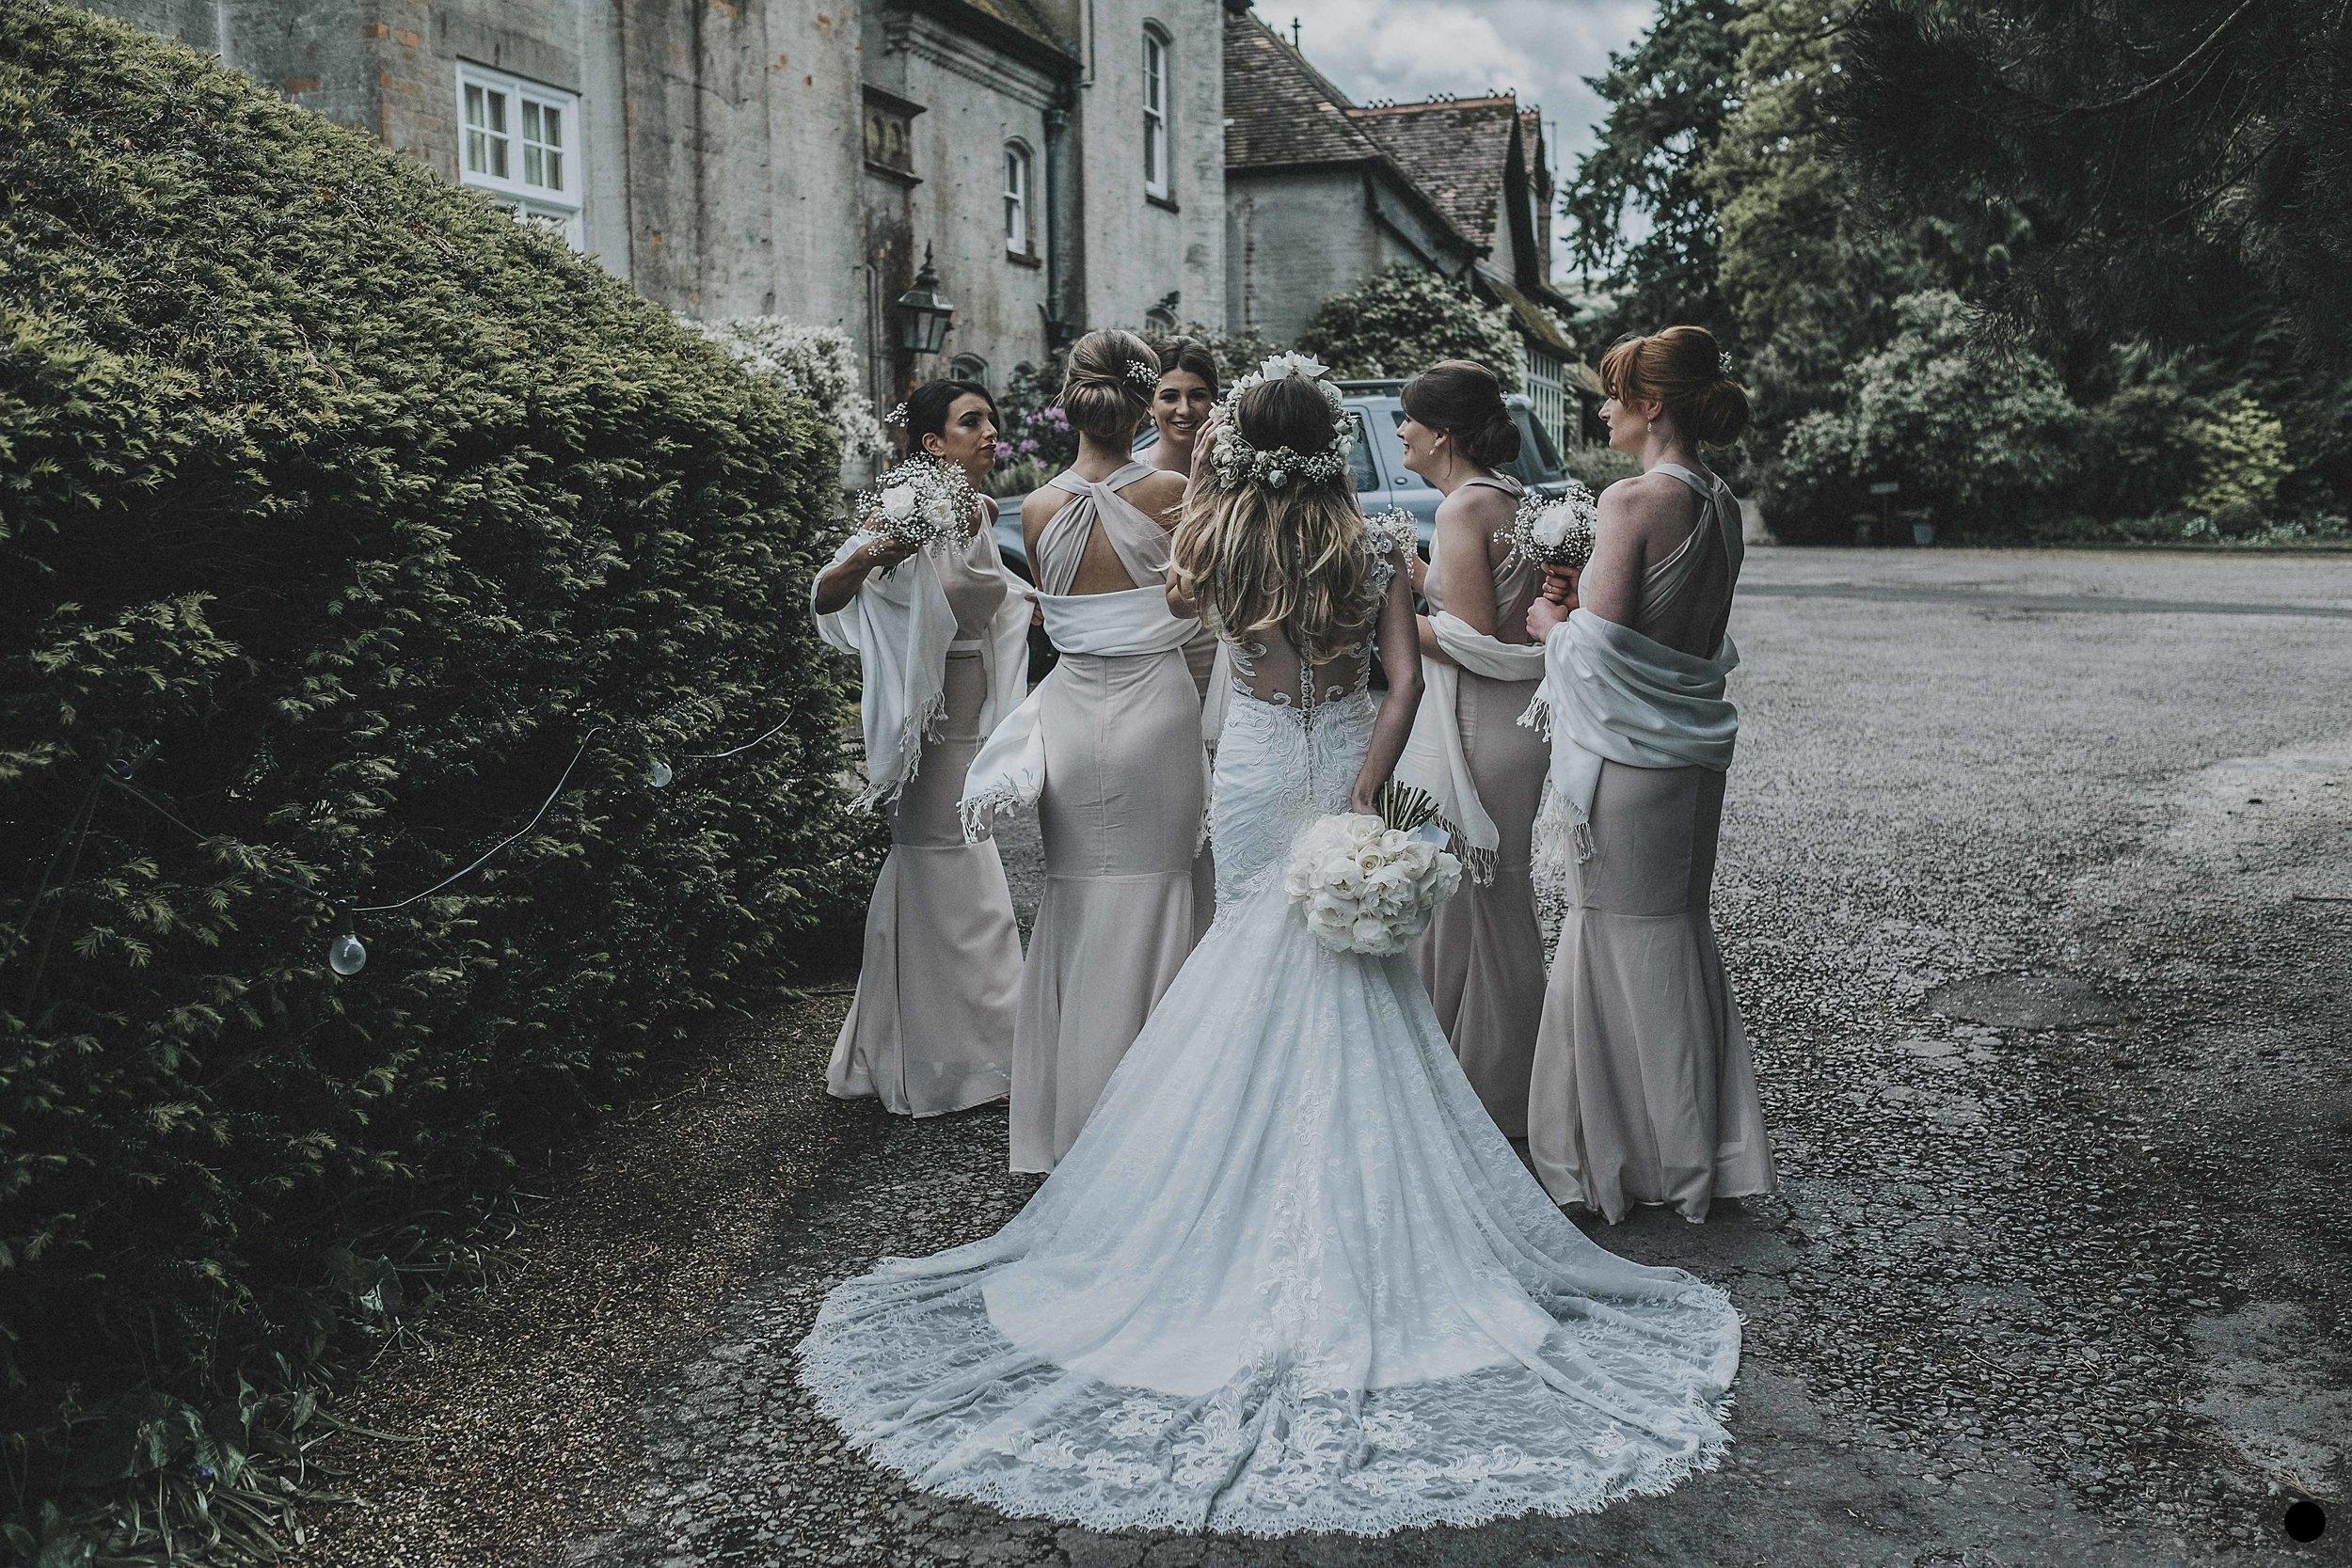 _DSF1736-Bridesmaids 2.jpg